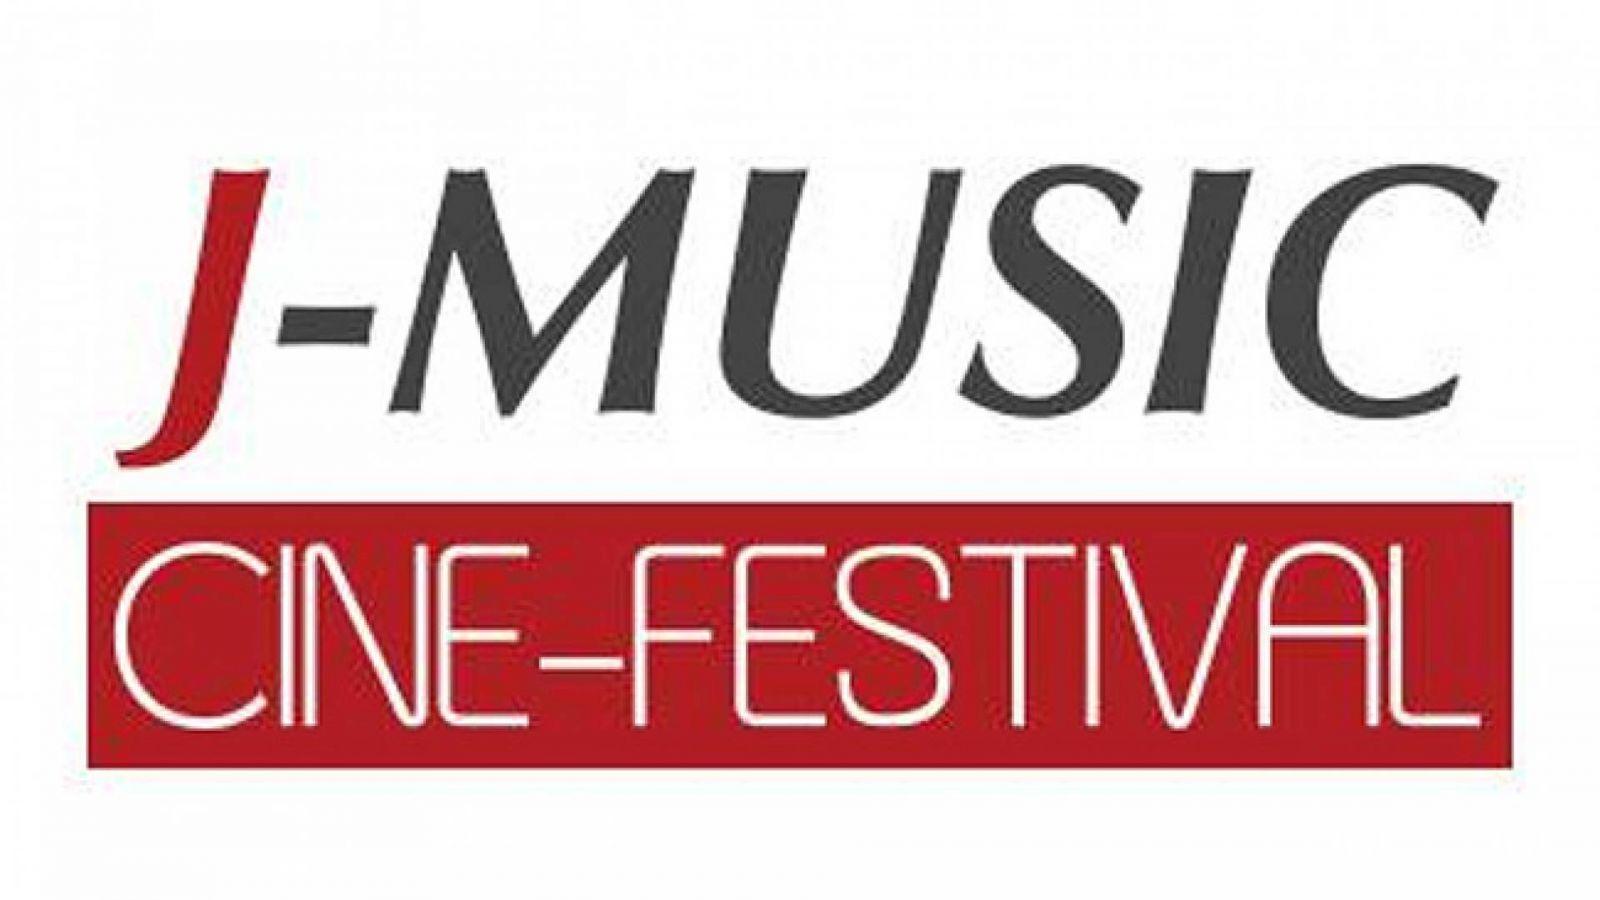 J-Music Cine Festival 2014 © J-Music Cine Festival